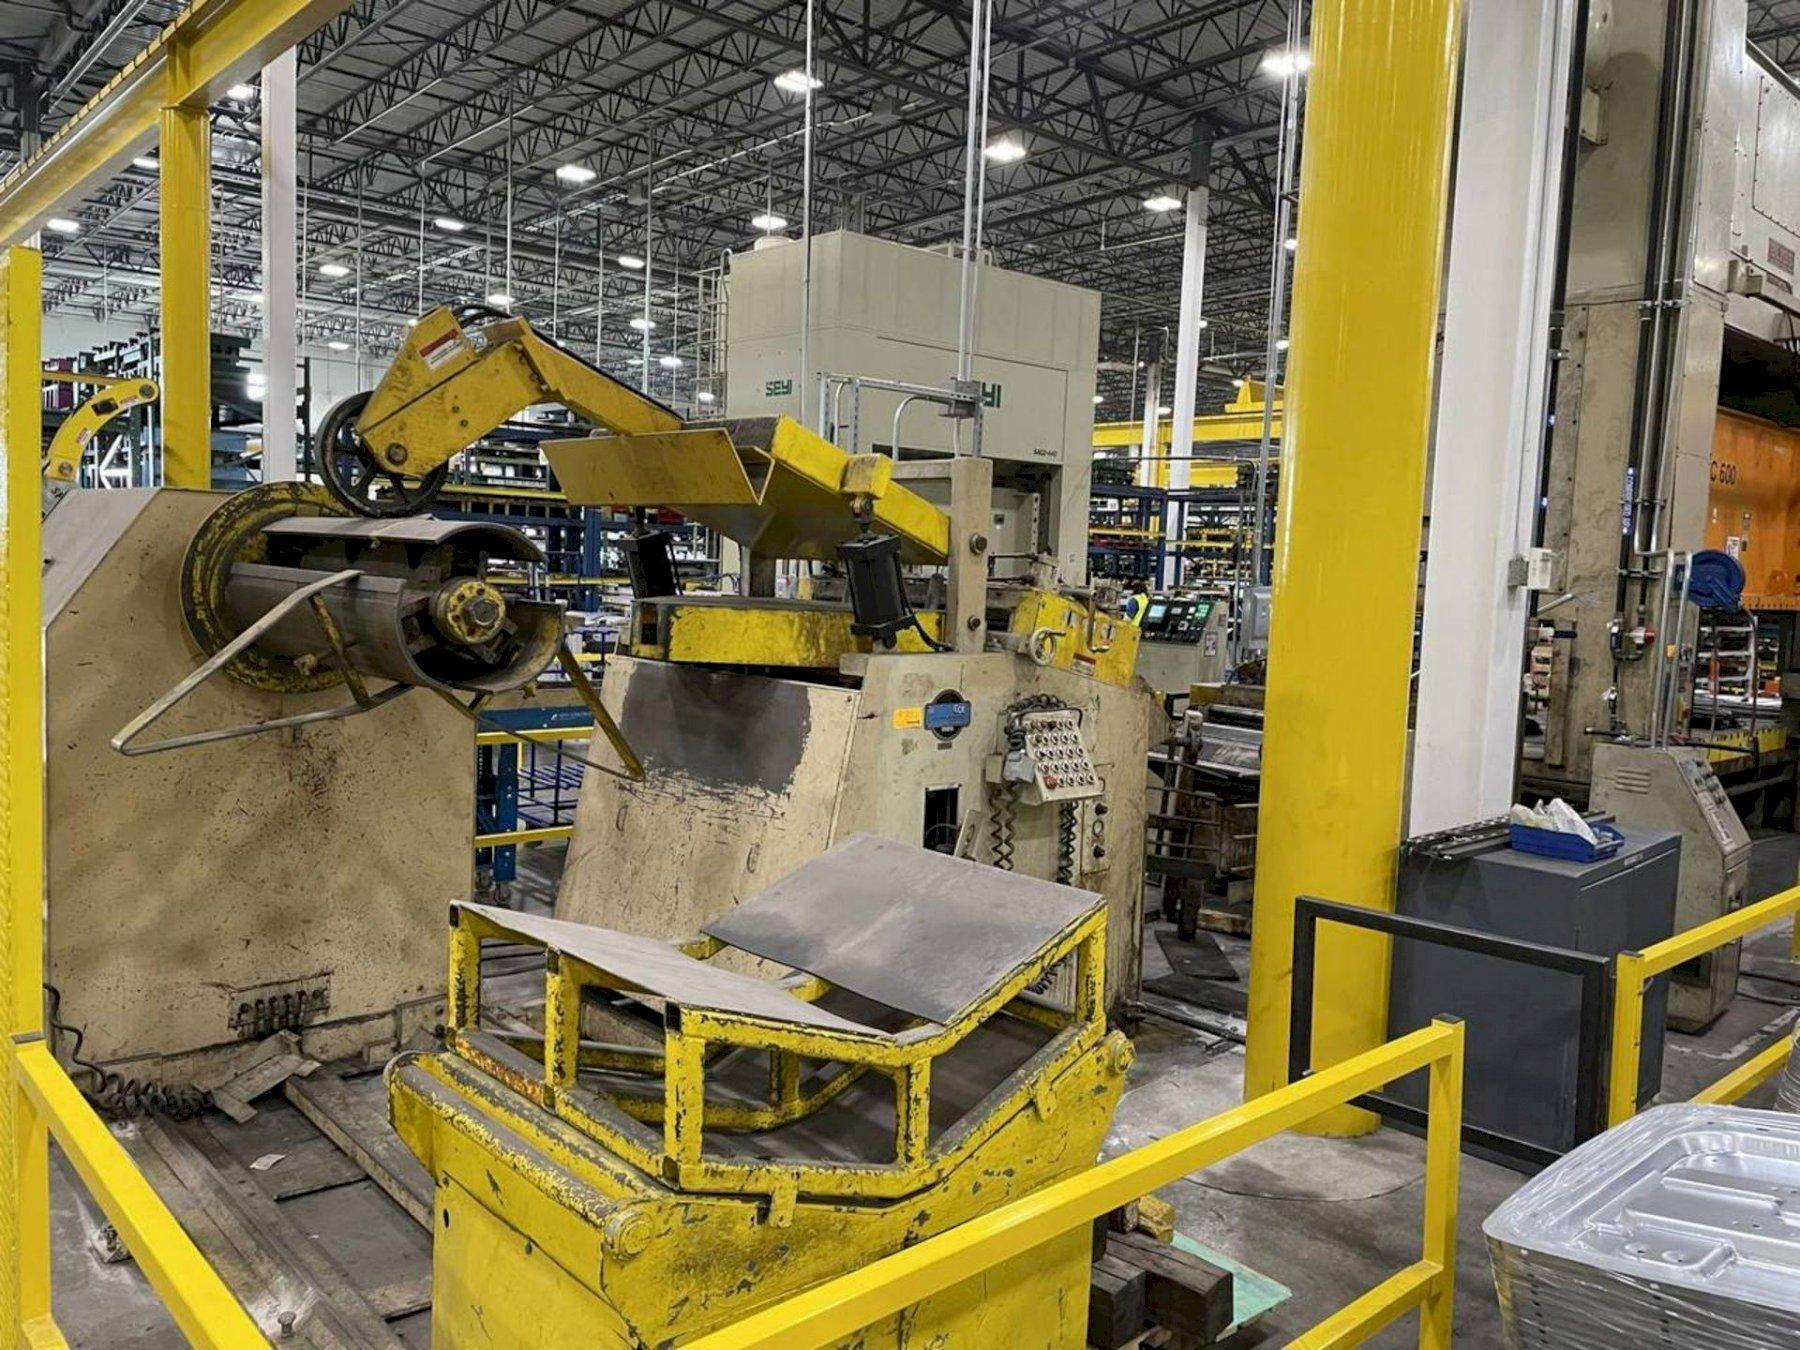 Coe Press Coil Feed Line 15,000 lb x 48